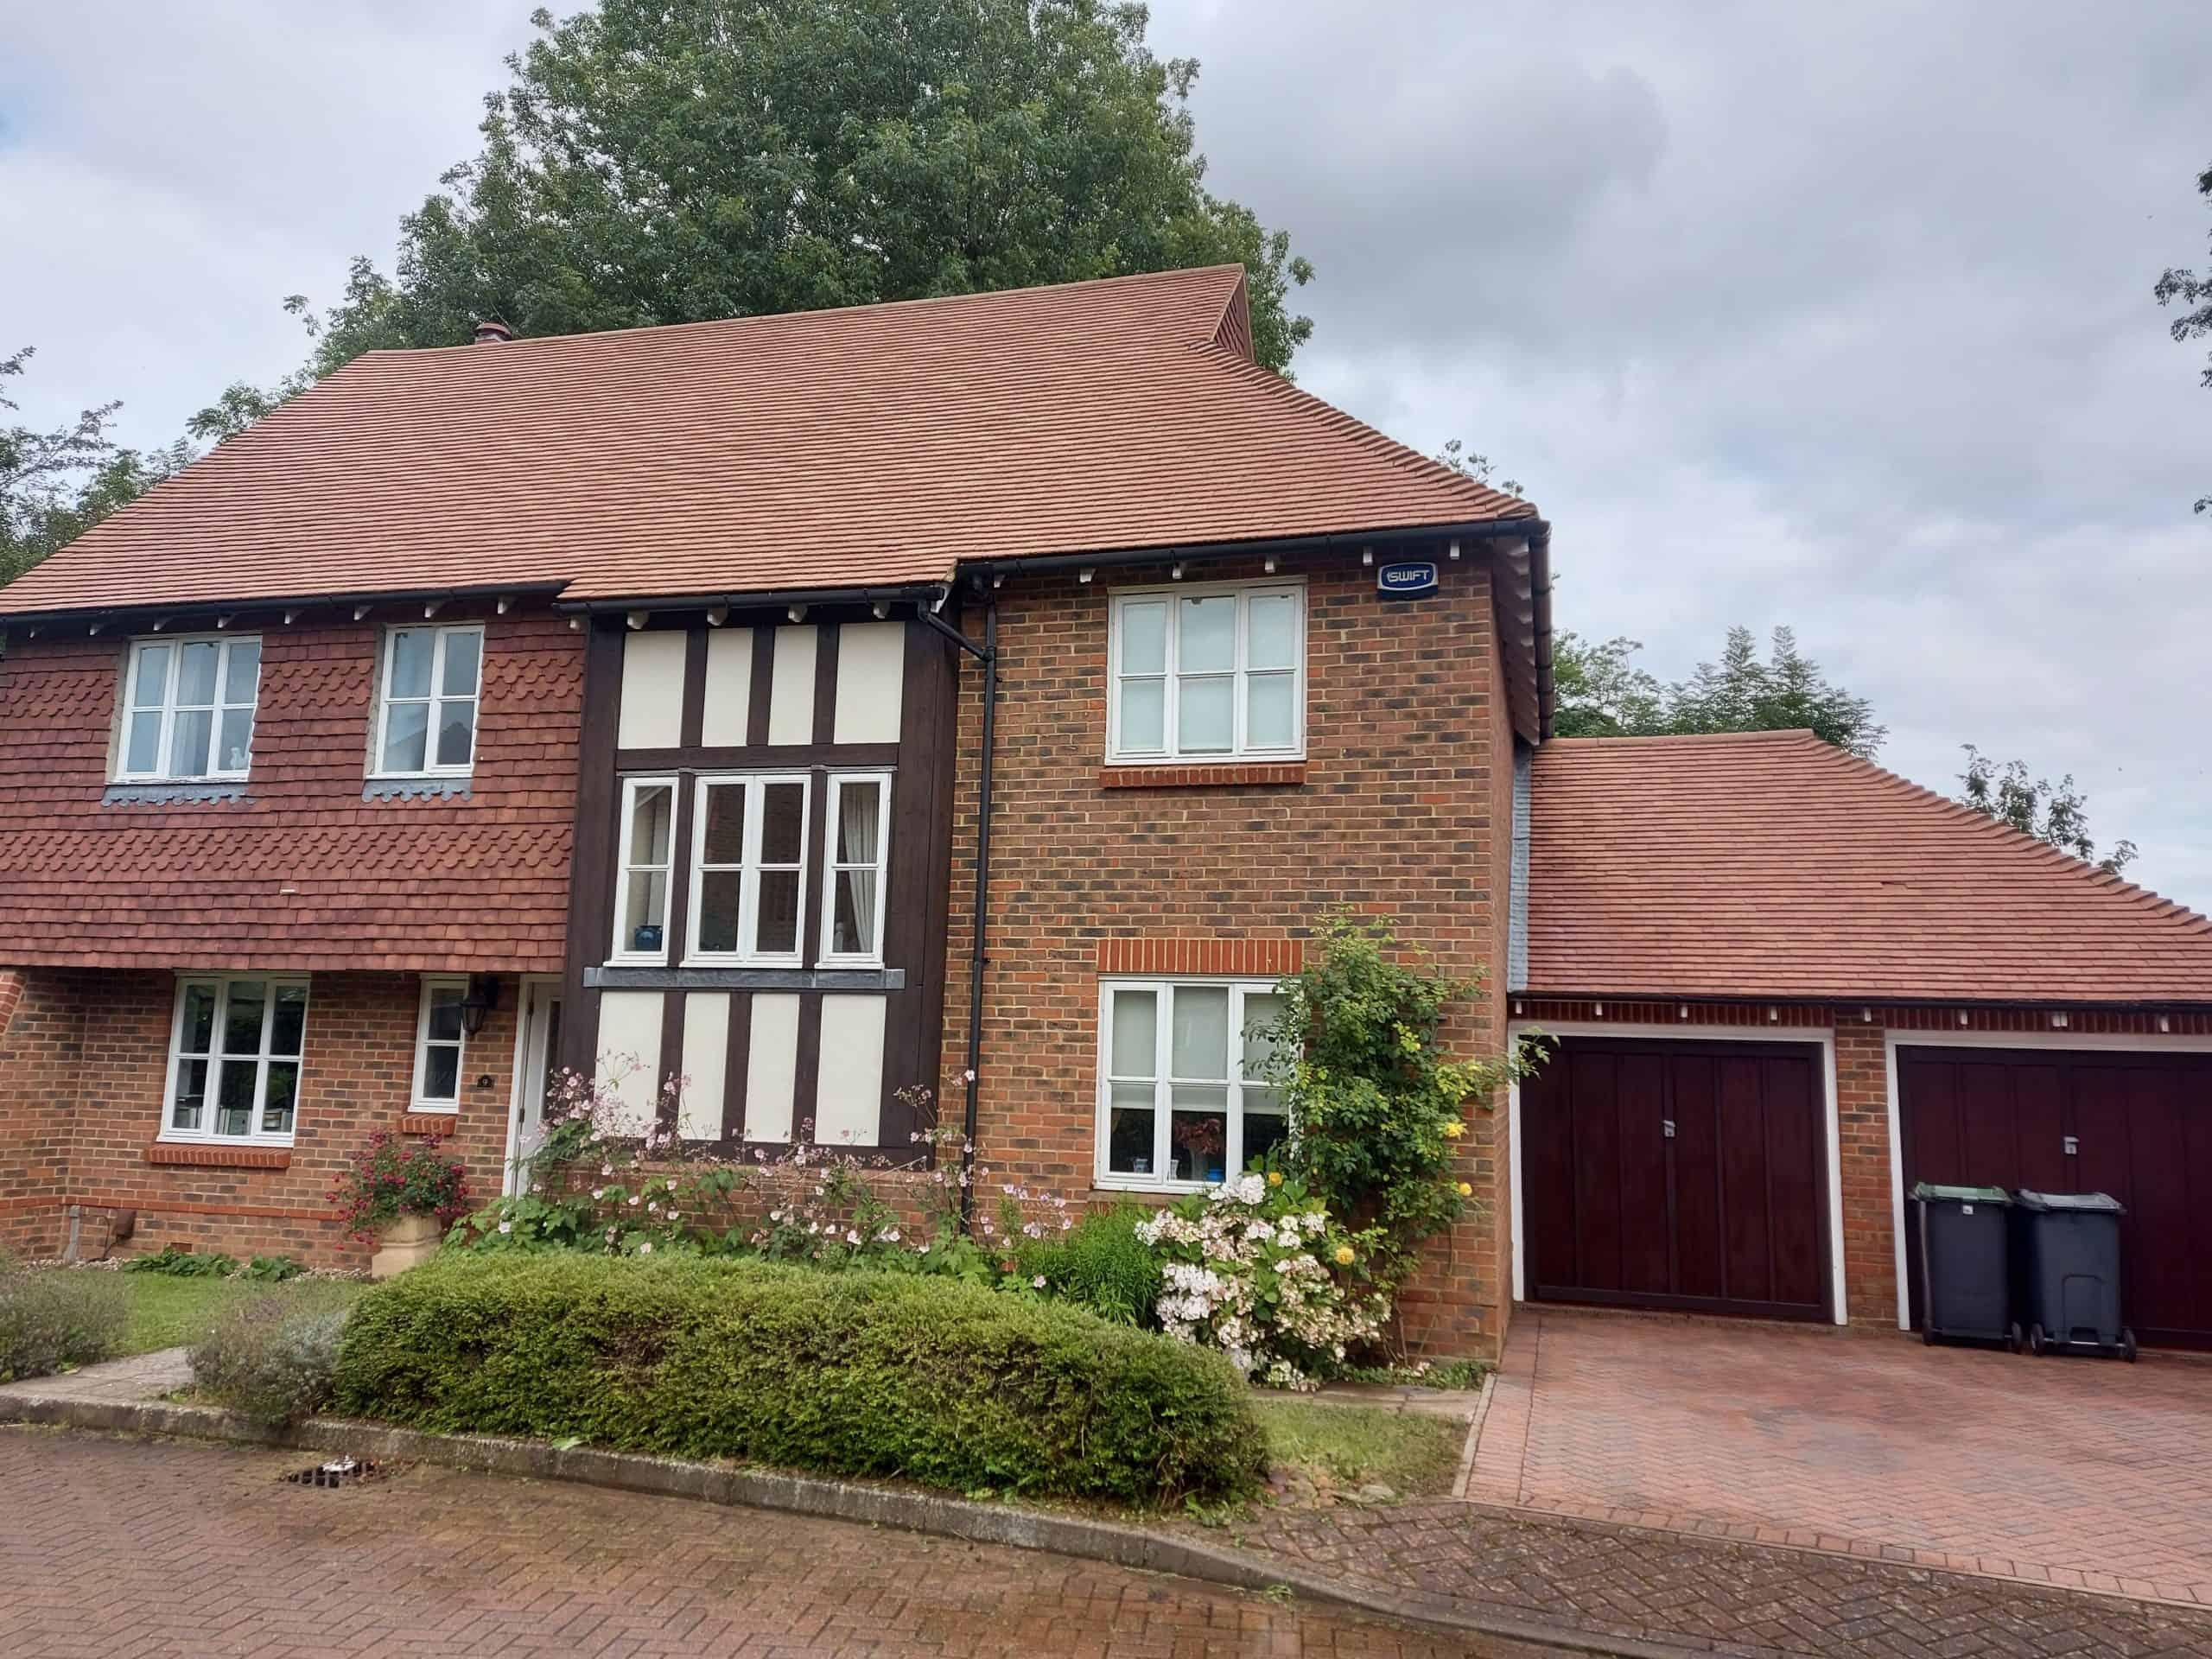 Pristine-Clean-Roof-Kent